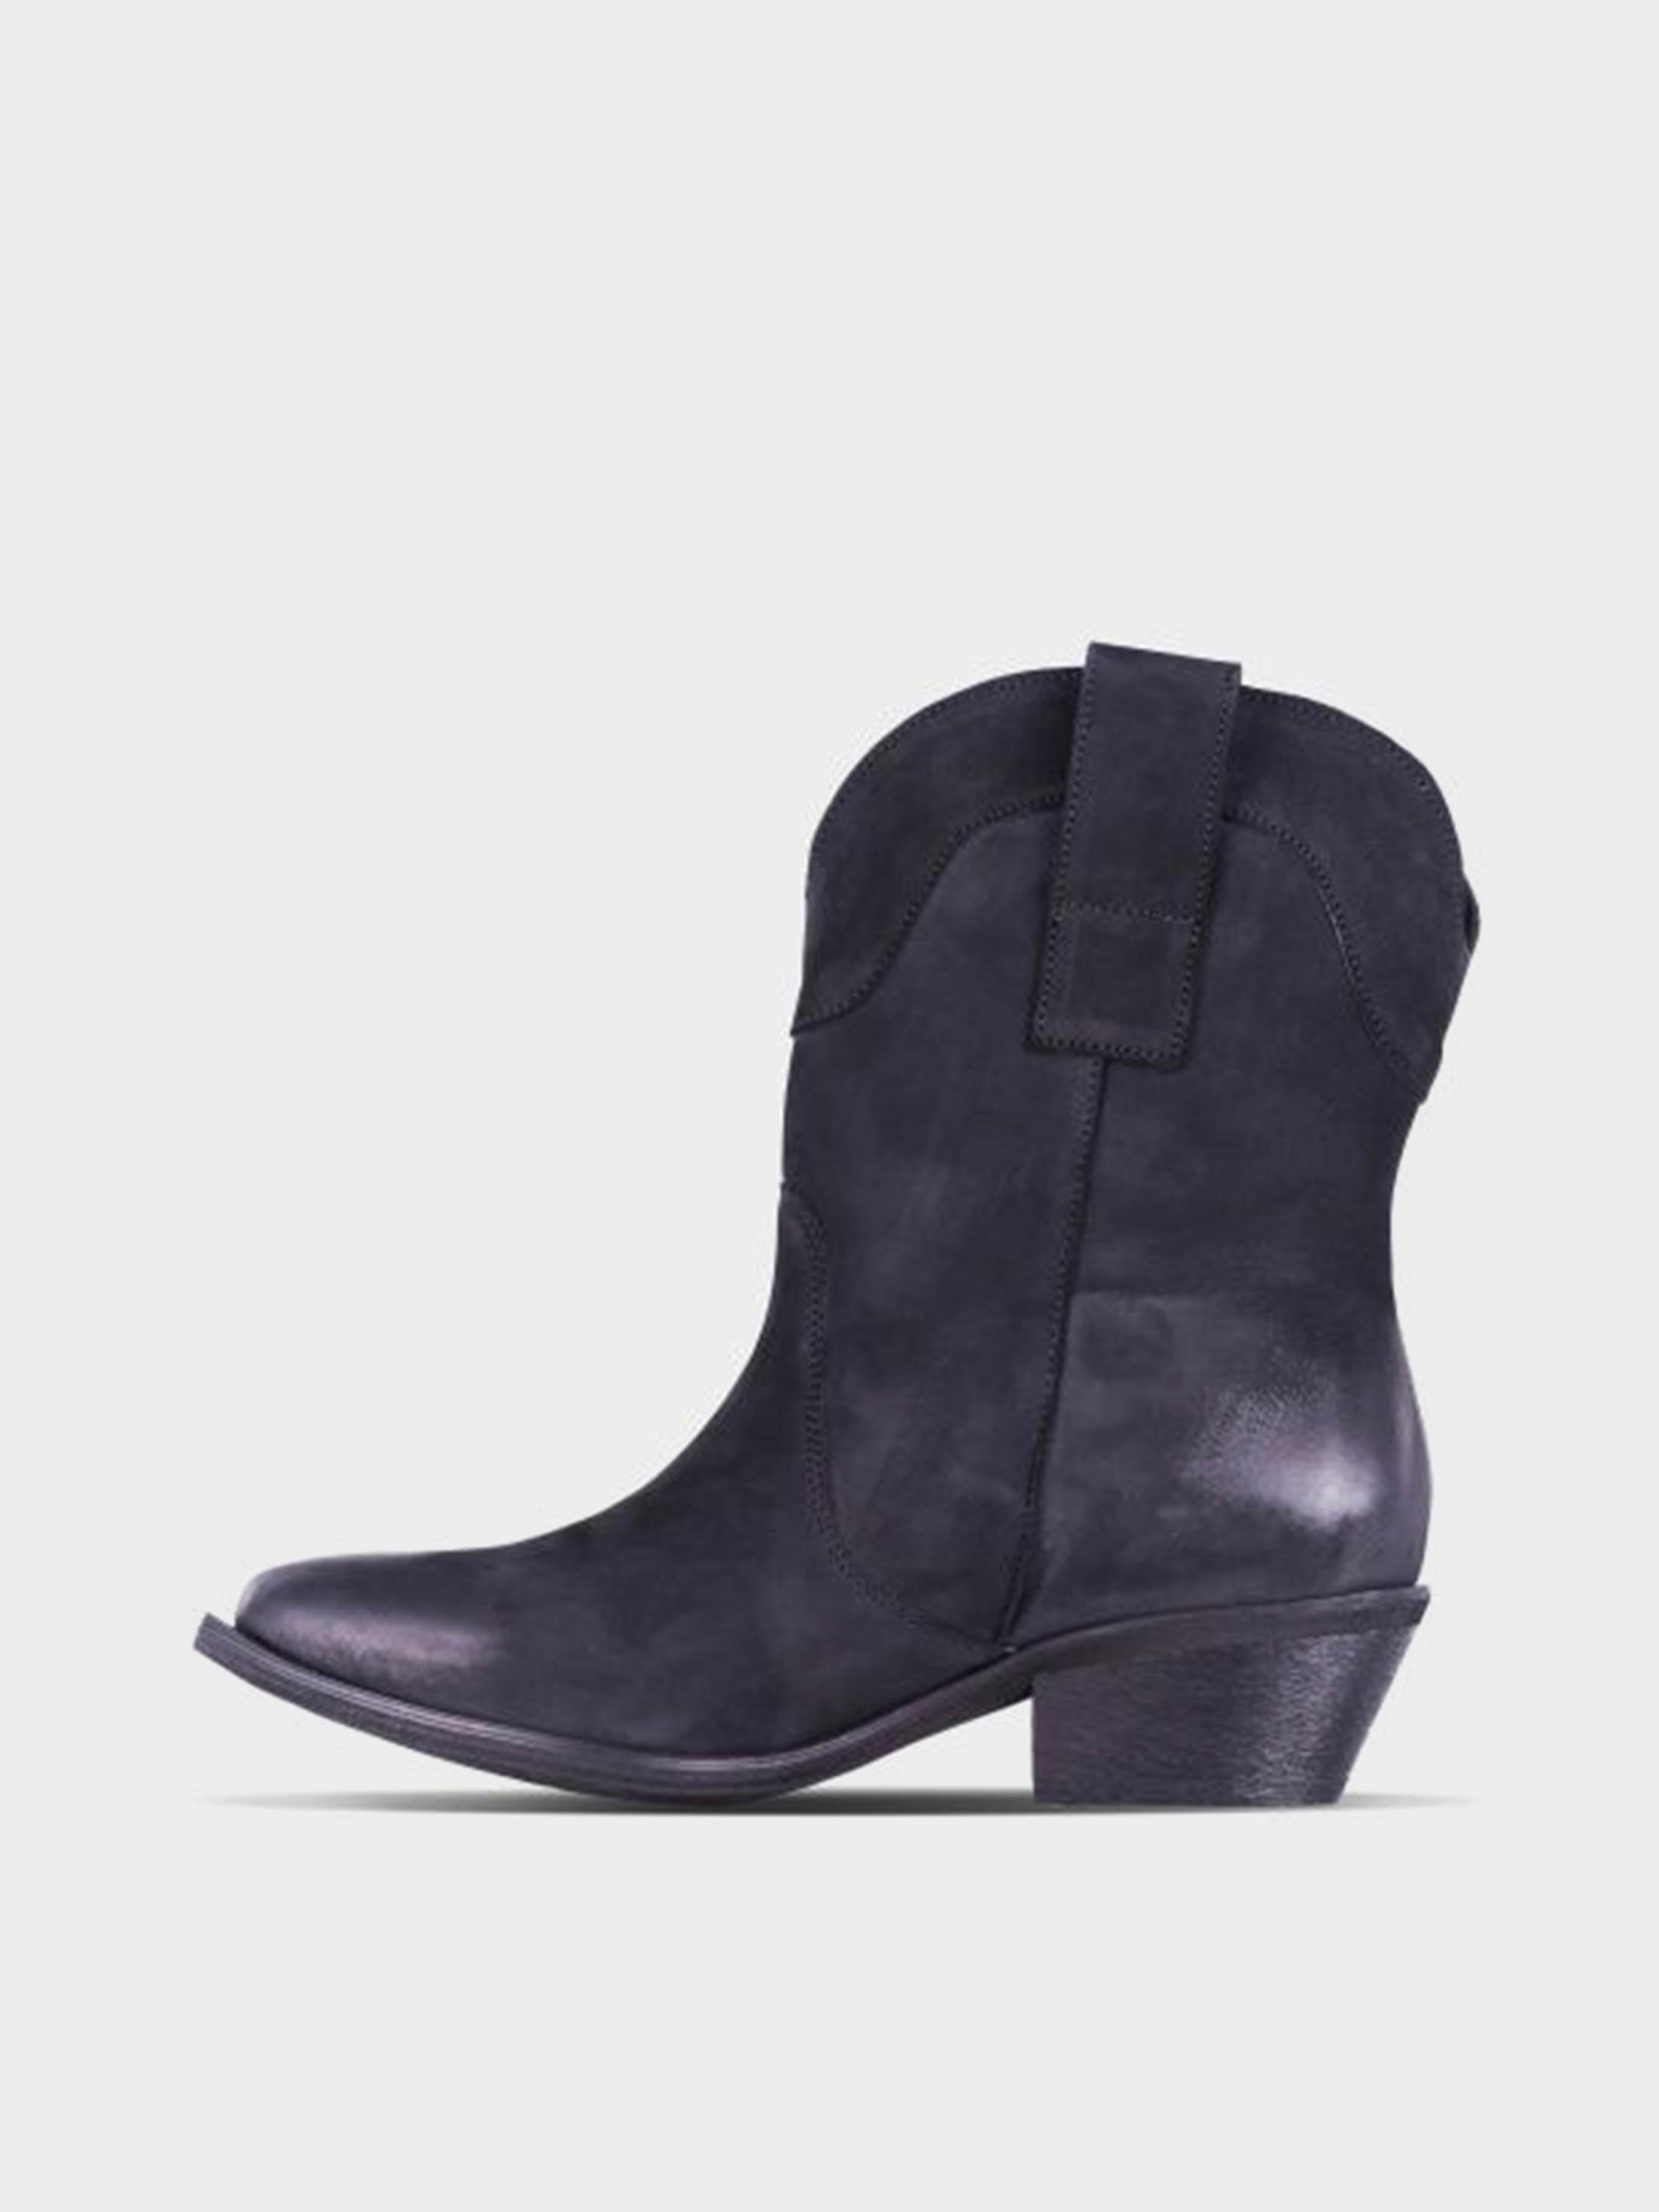 Ботинки для женщин Kasandra 5W40 размерная сетка обуви, 2017